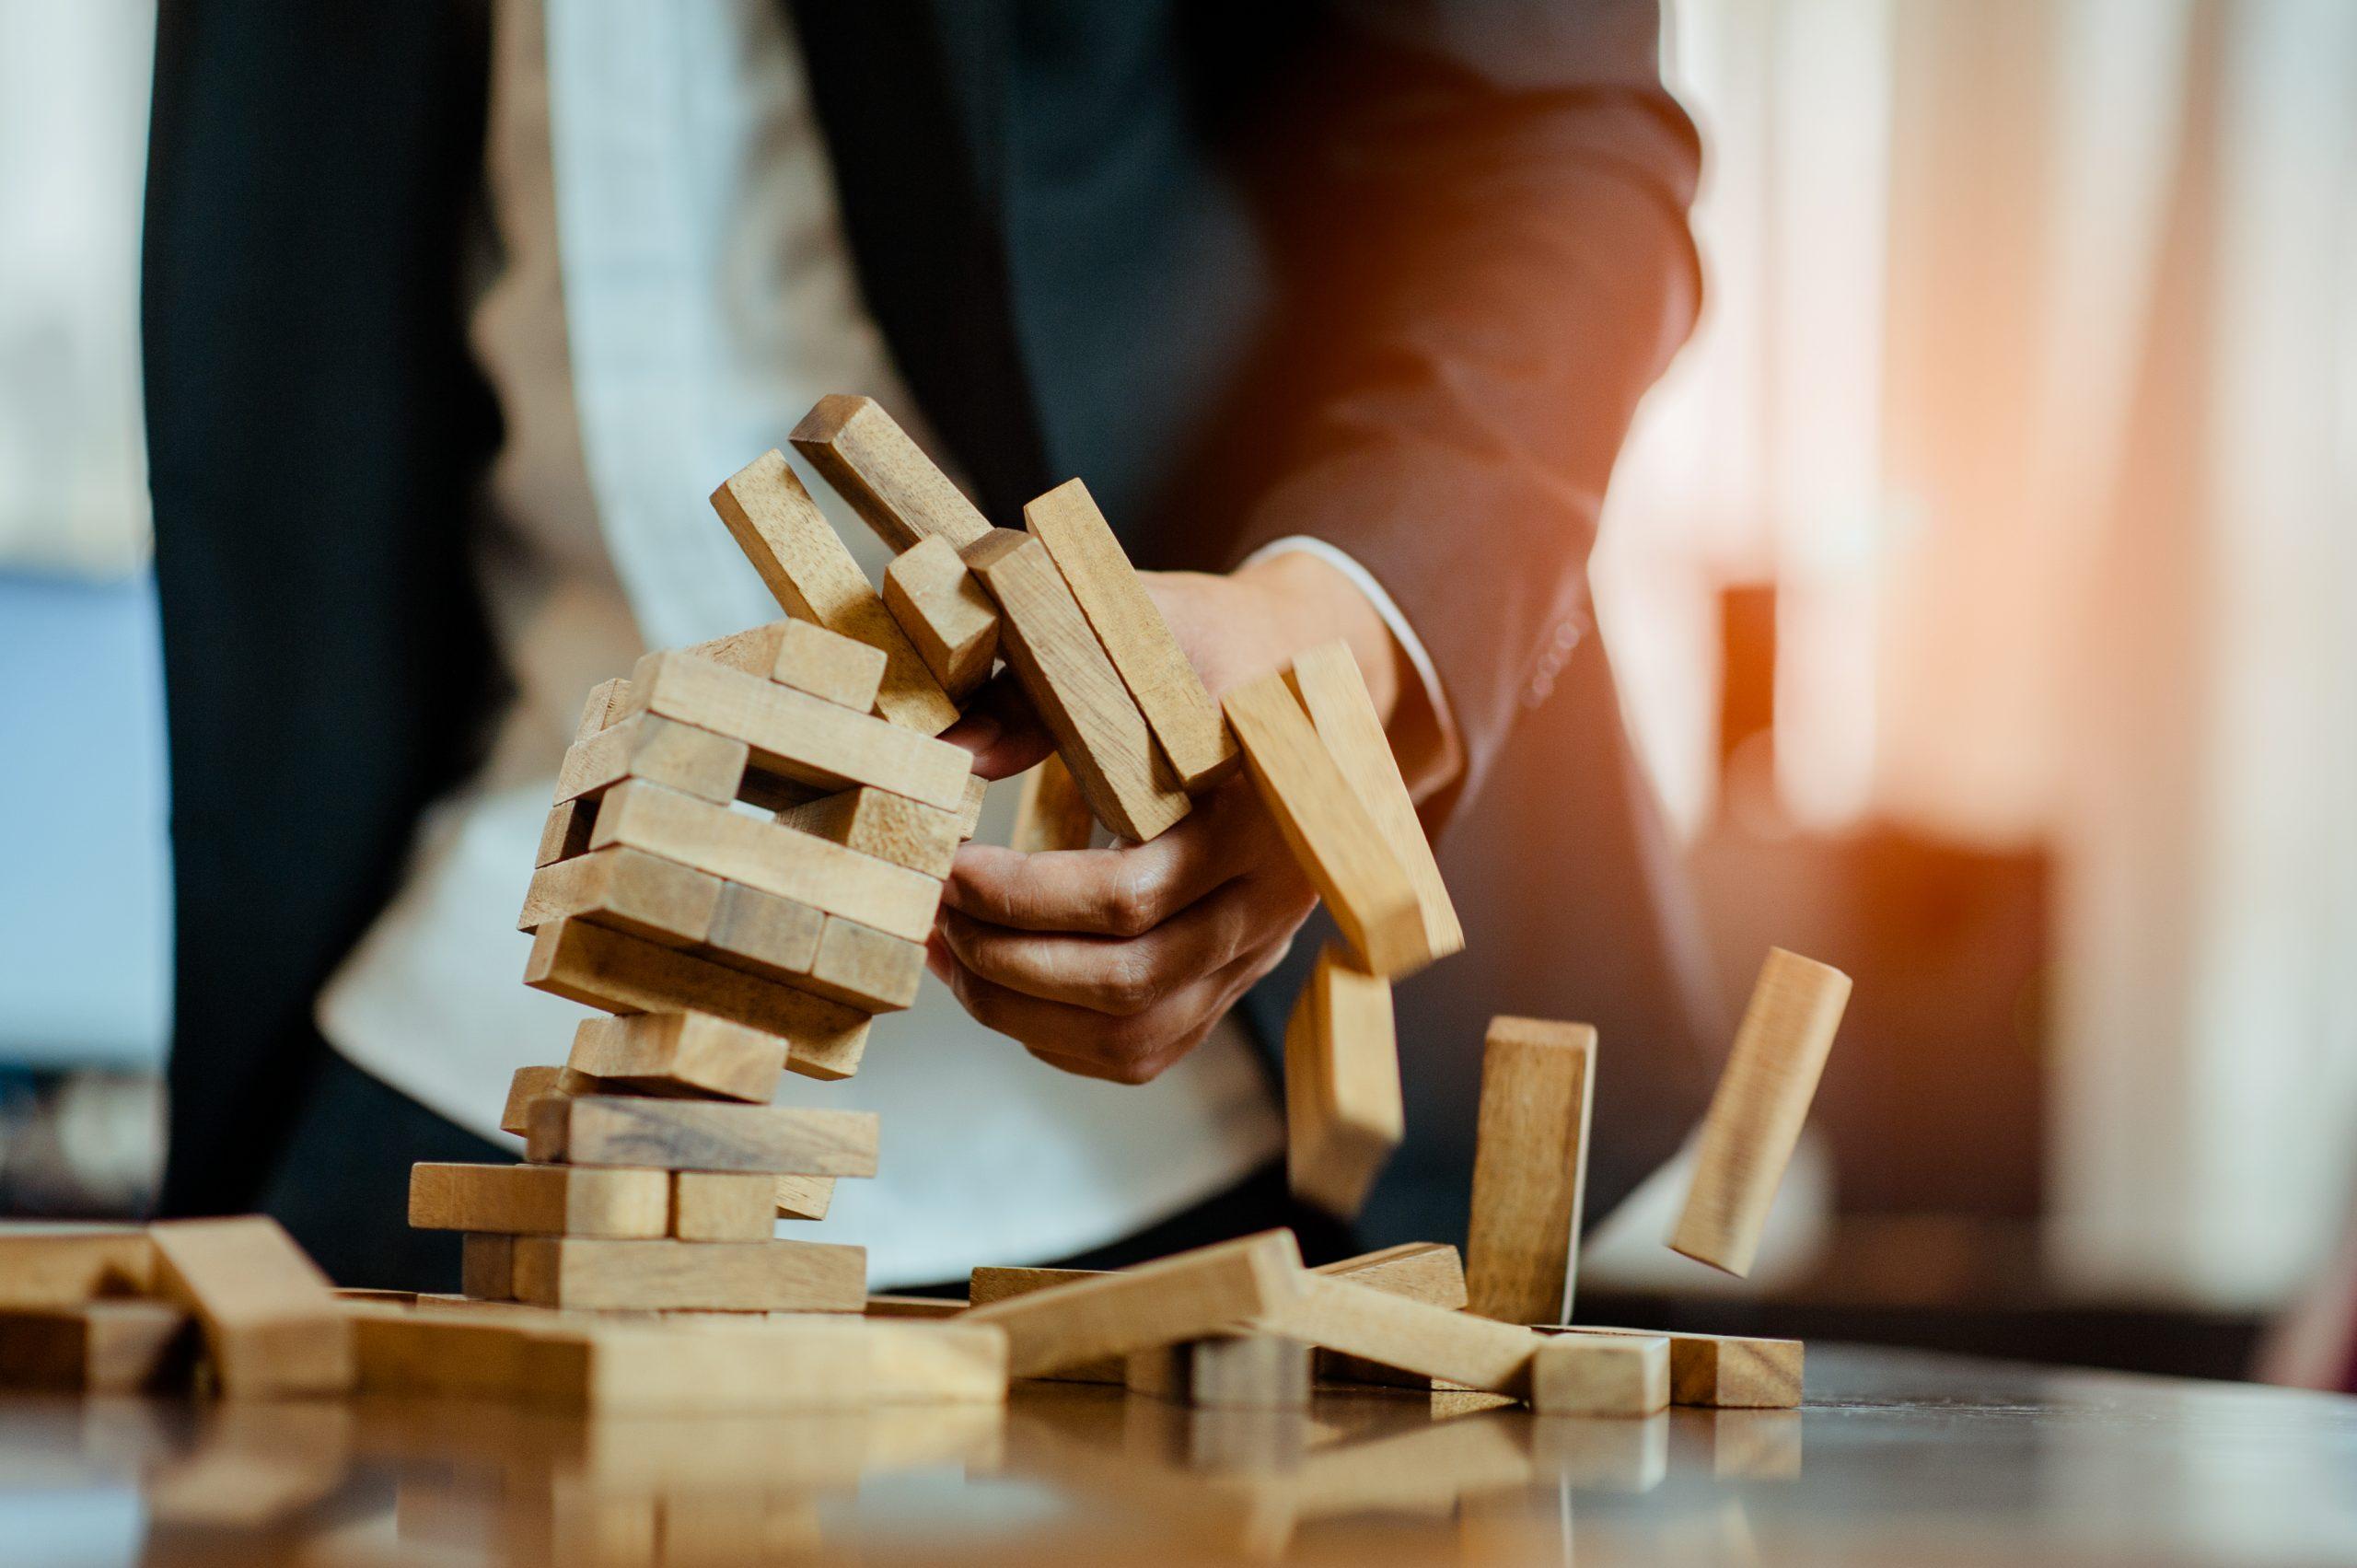 man breaking apart a tower of wooden blocks